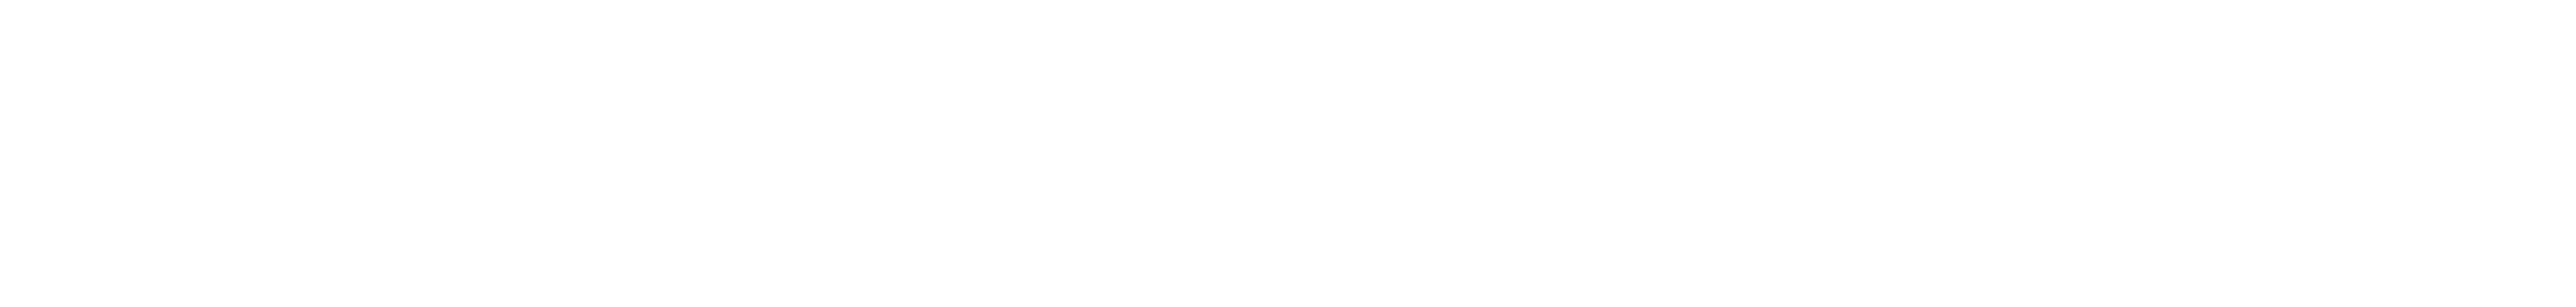 Appdynamics